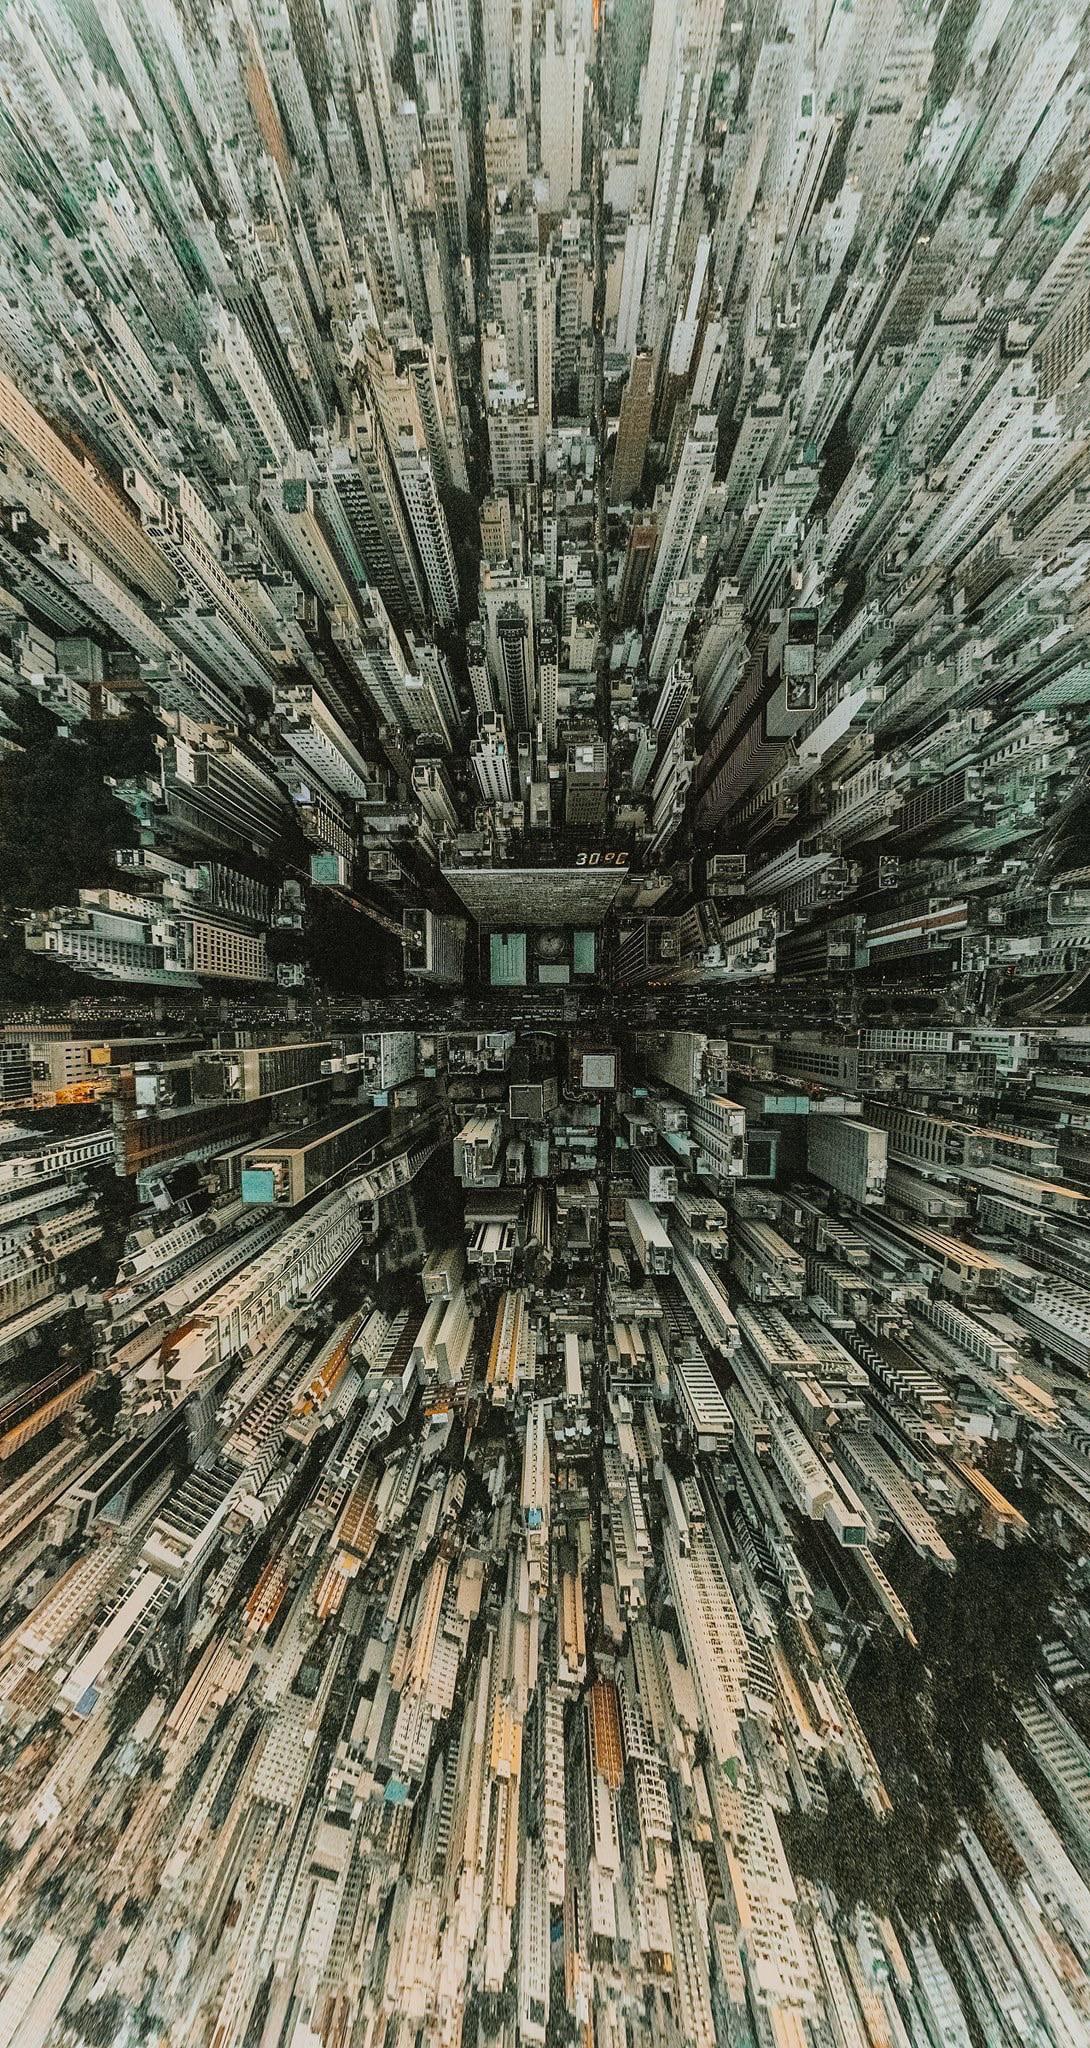 Sao Paulo Brazil city cities buildings photography in